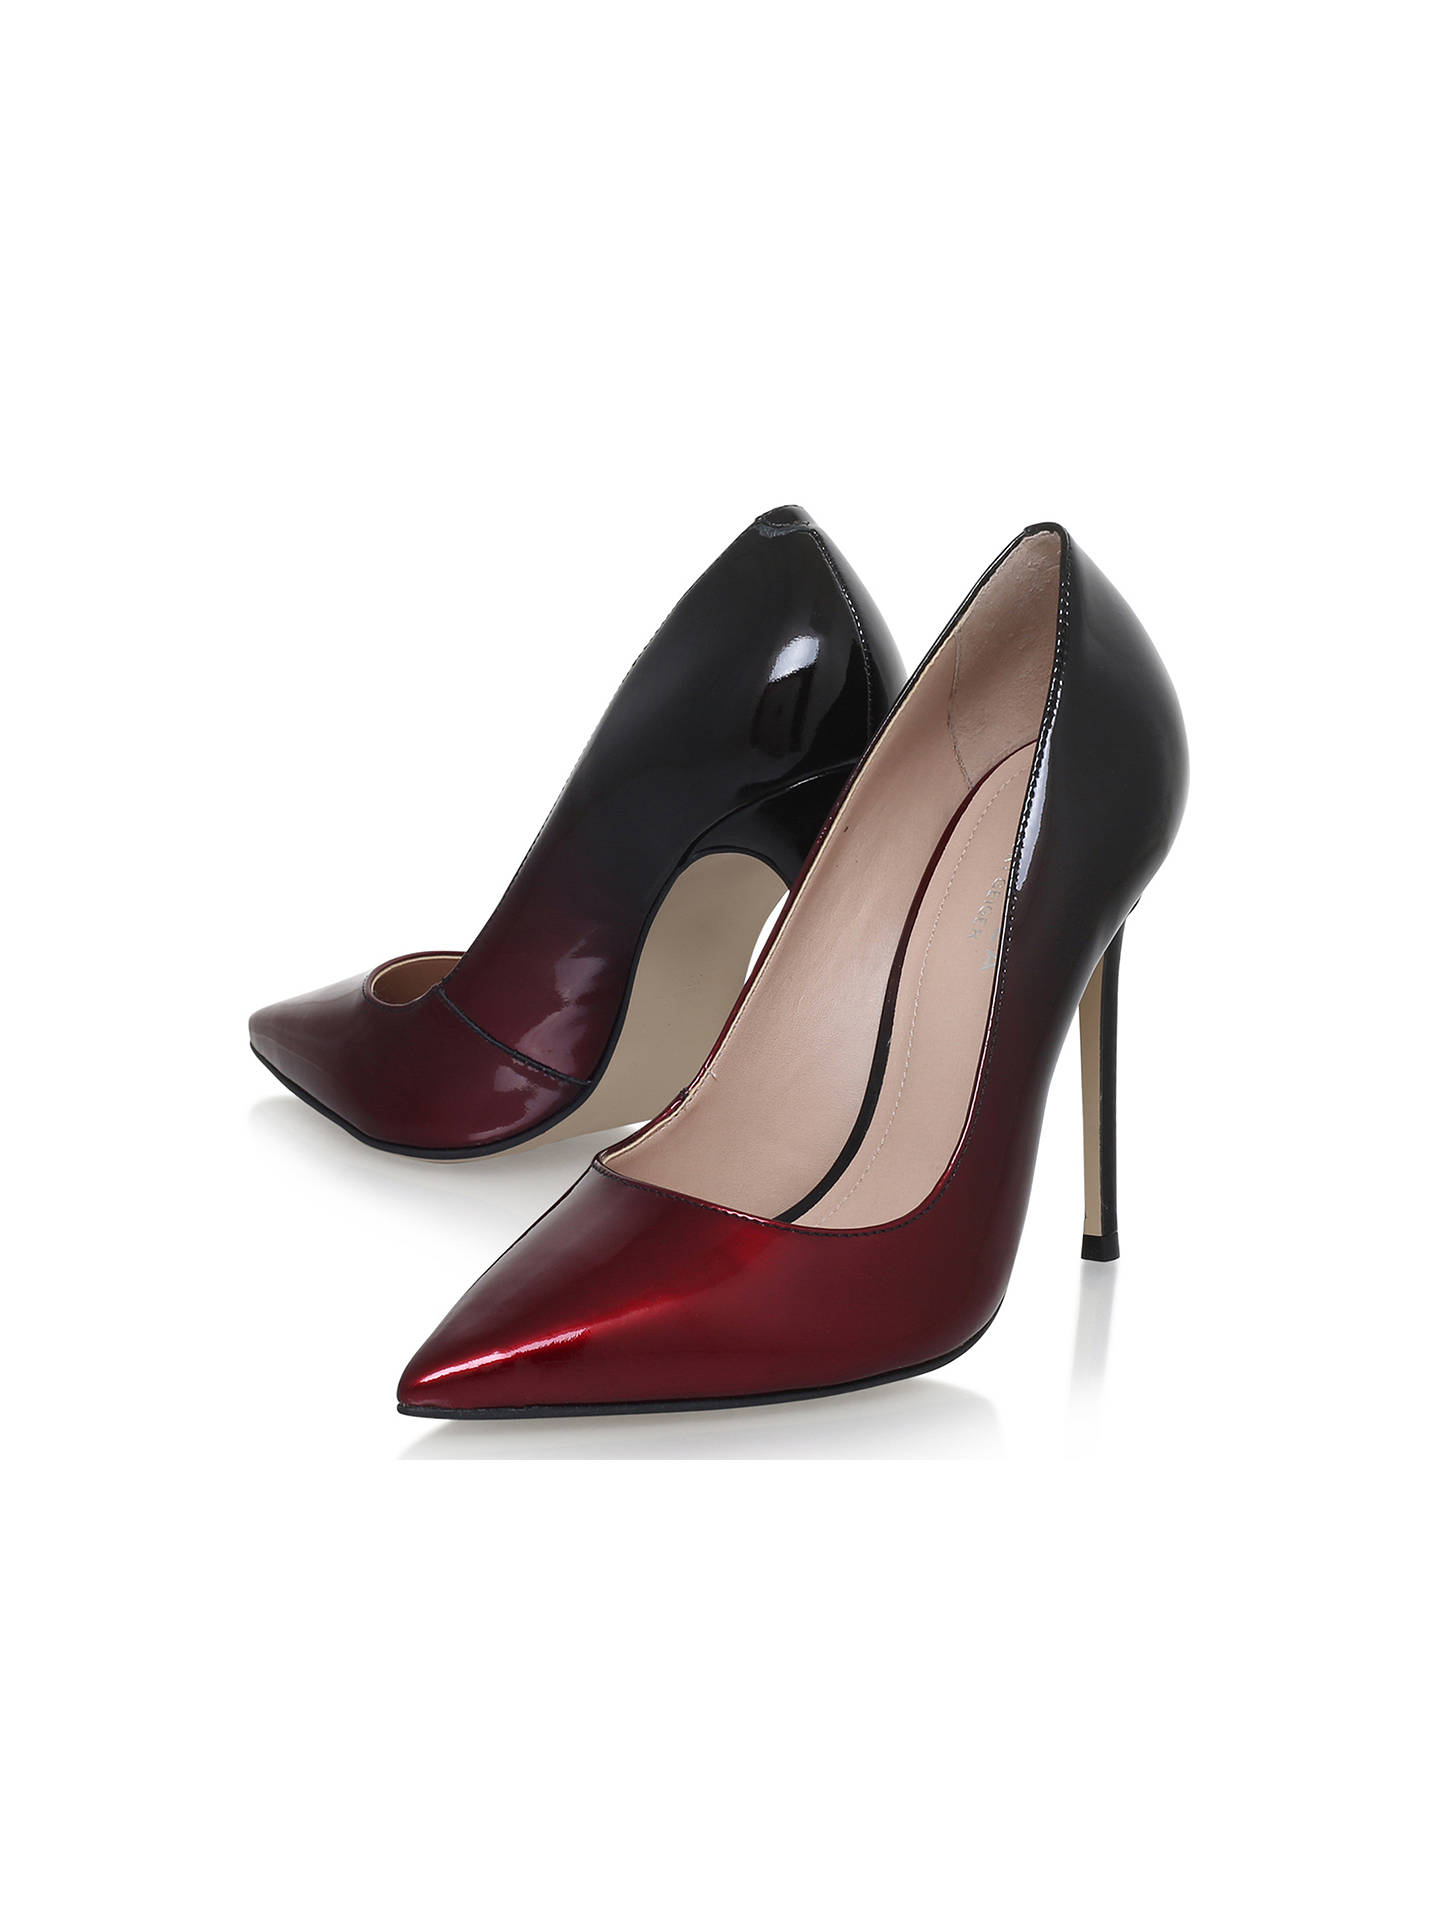 245151a0413 Carvela Alice Stiletto Heel Court Shoes, Wine Patent Leather